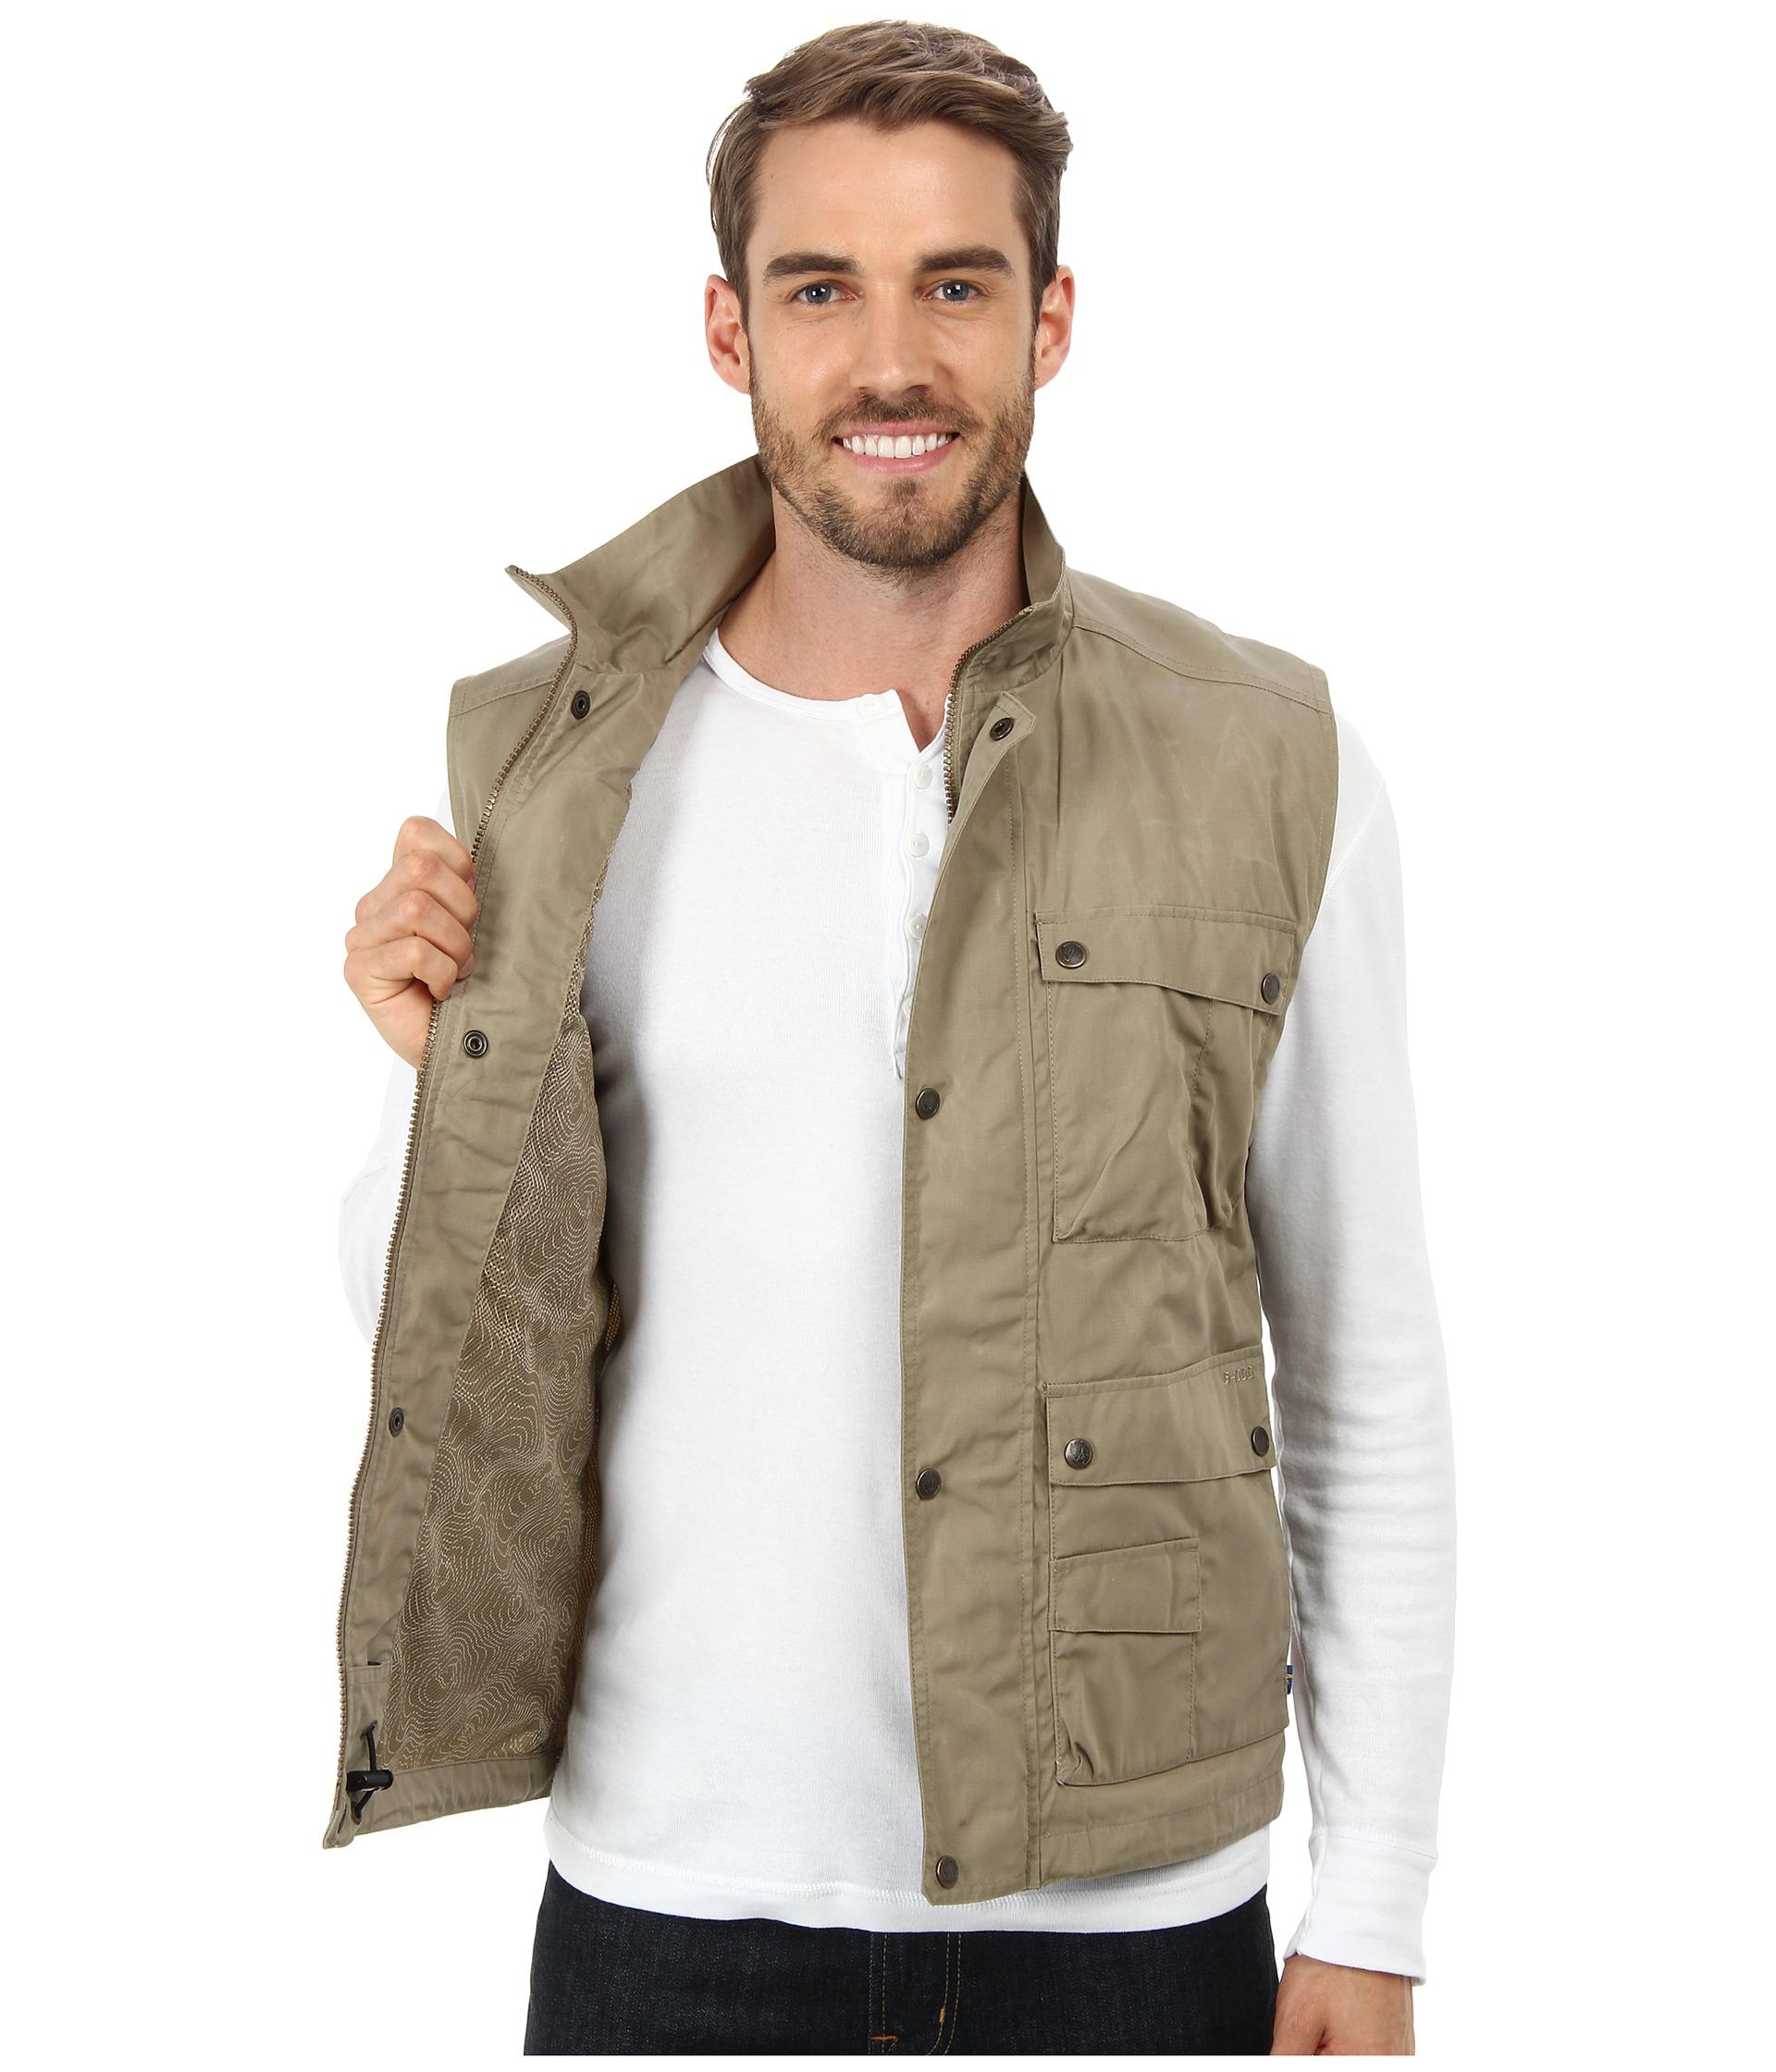 new products 2b781 76f98 Fjallraven Natural Reporter Lite Vest for men